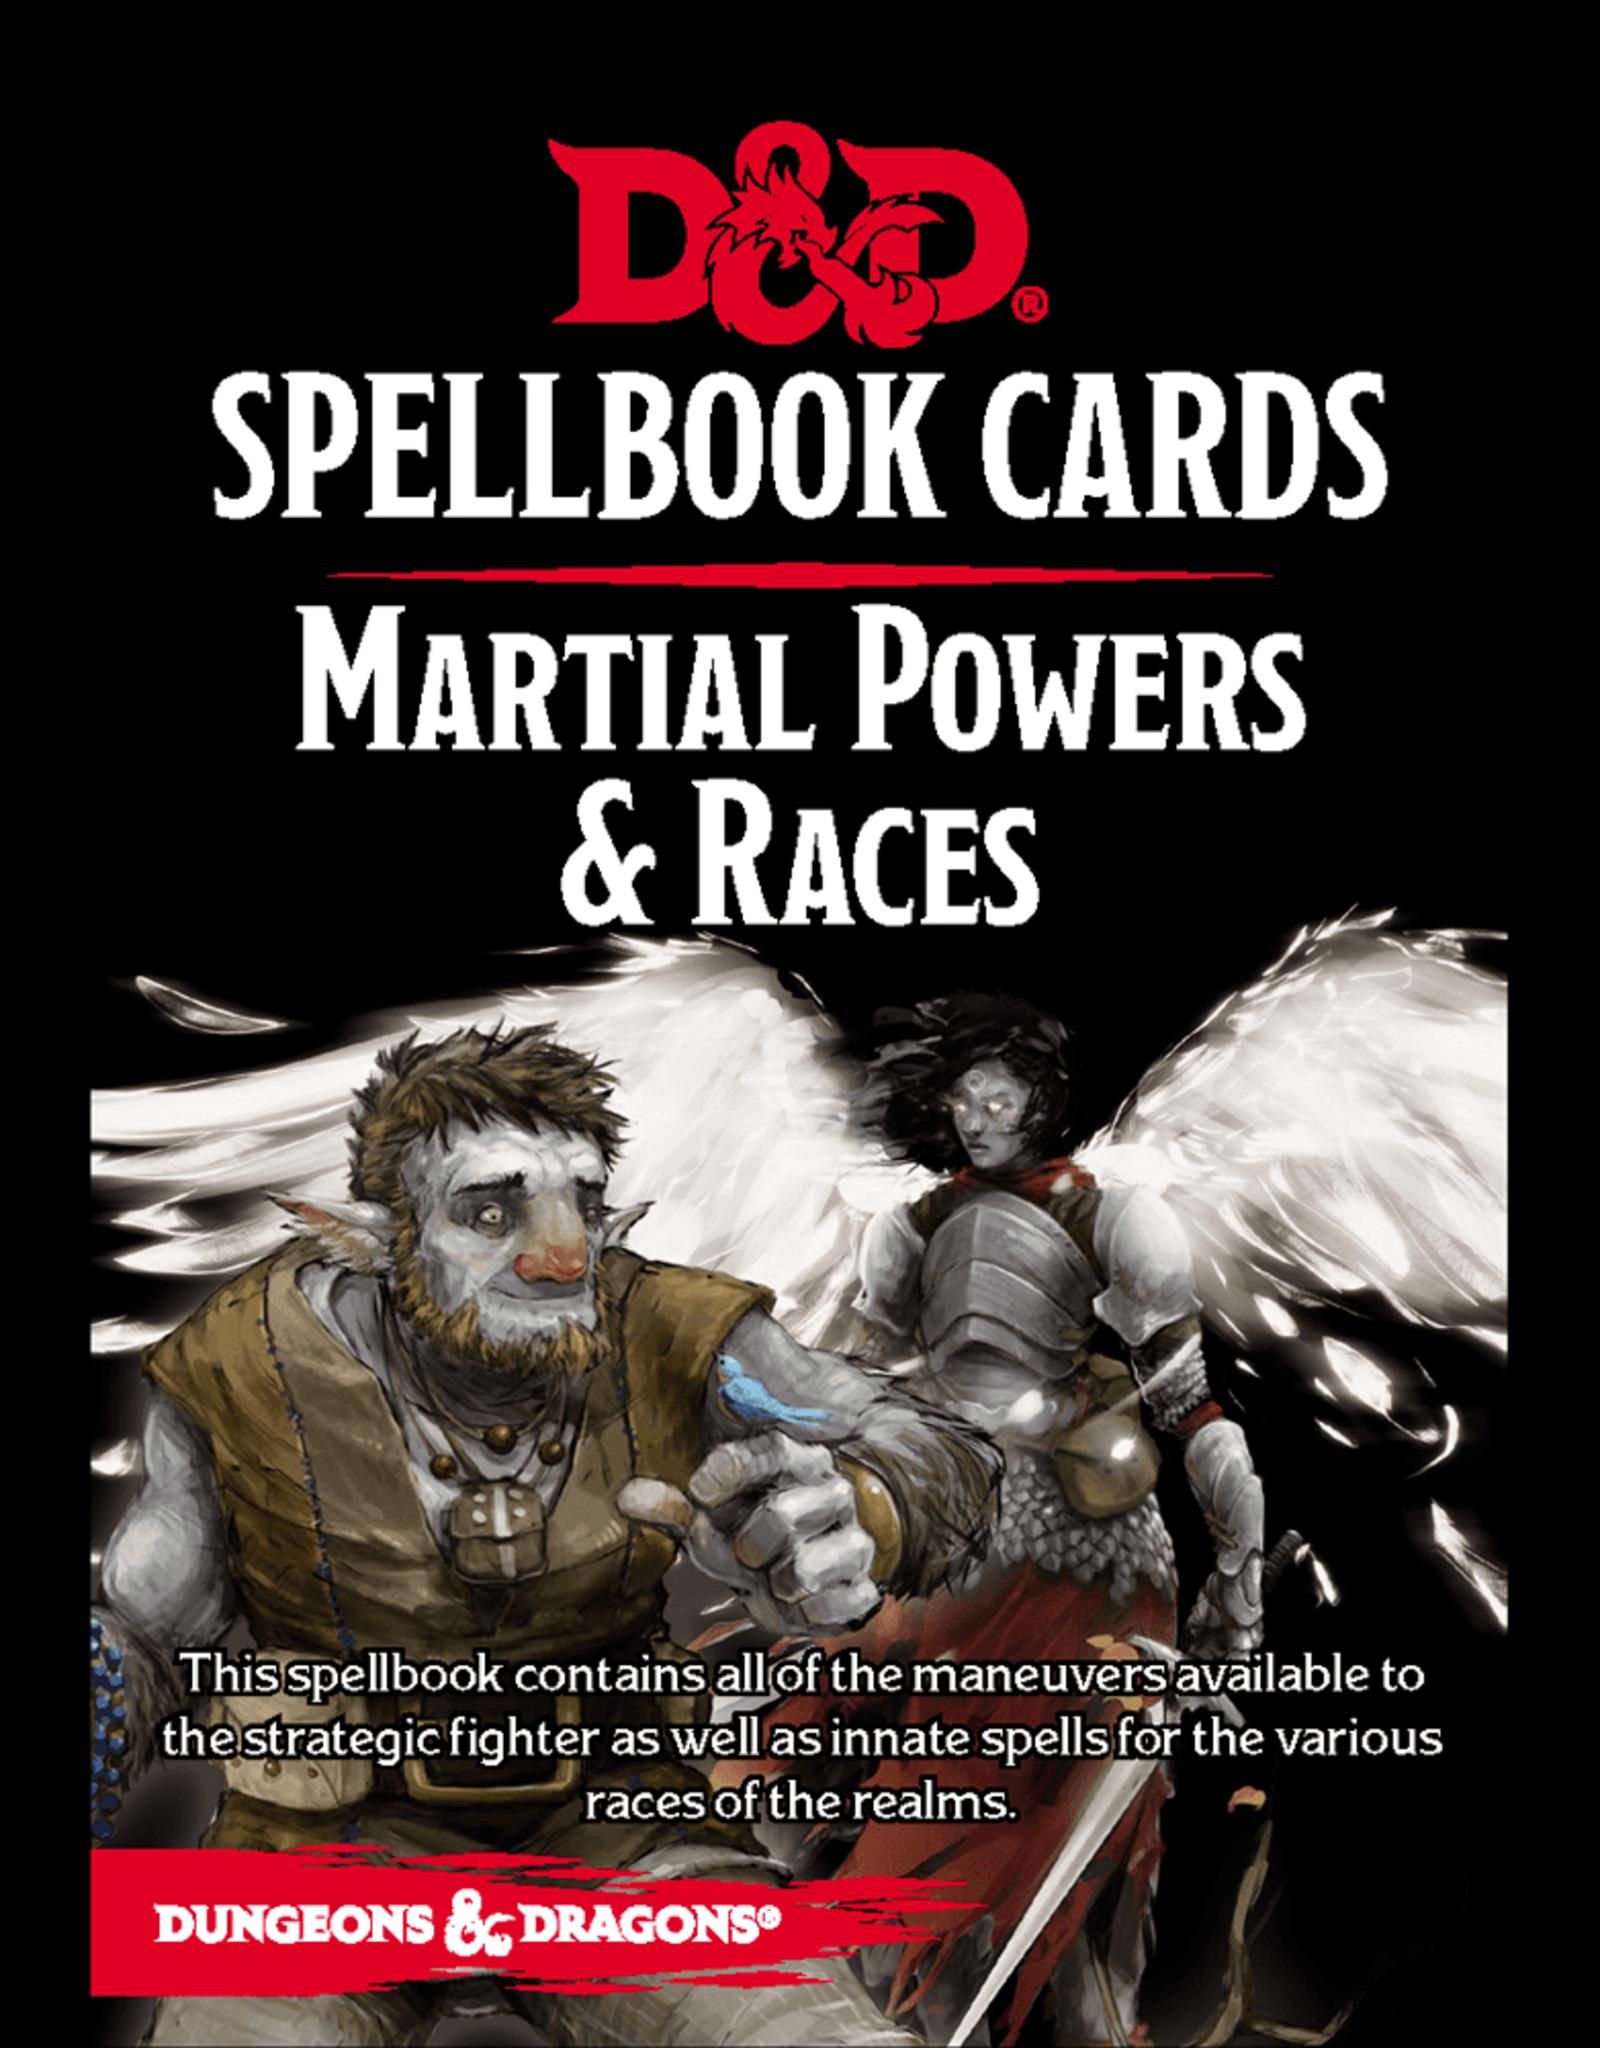 D&D Spellbook Cards: Martial